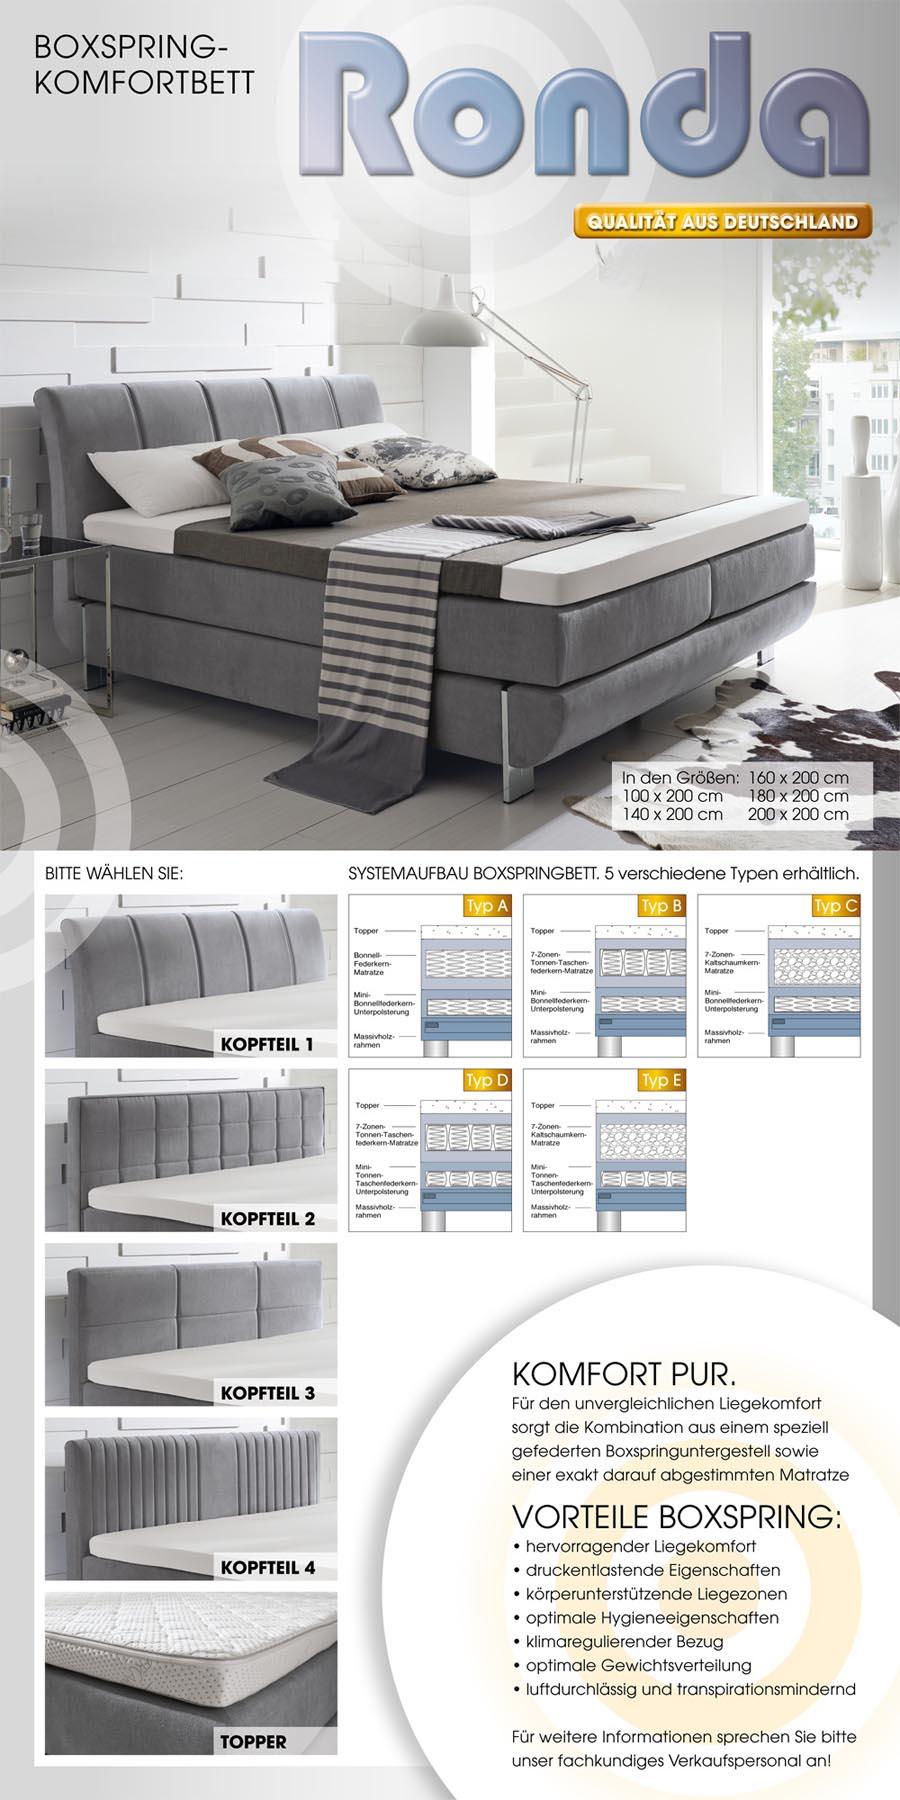 boxspringbett ronda 870 00. Black Bedroom Furniture Sets. Home Design Ideas